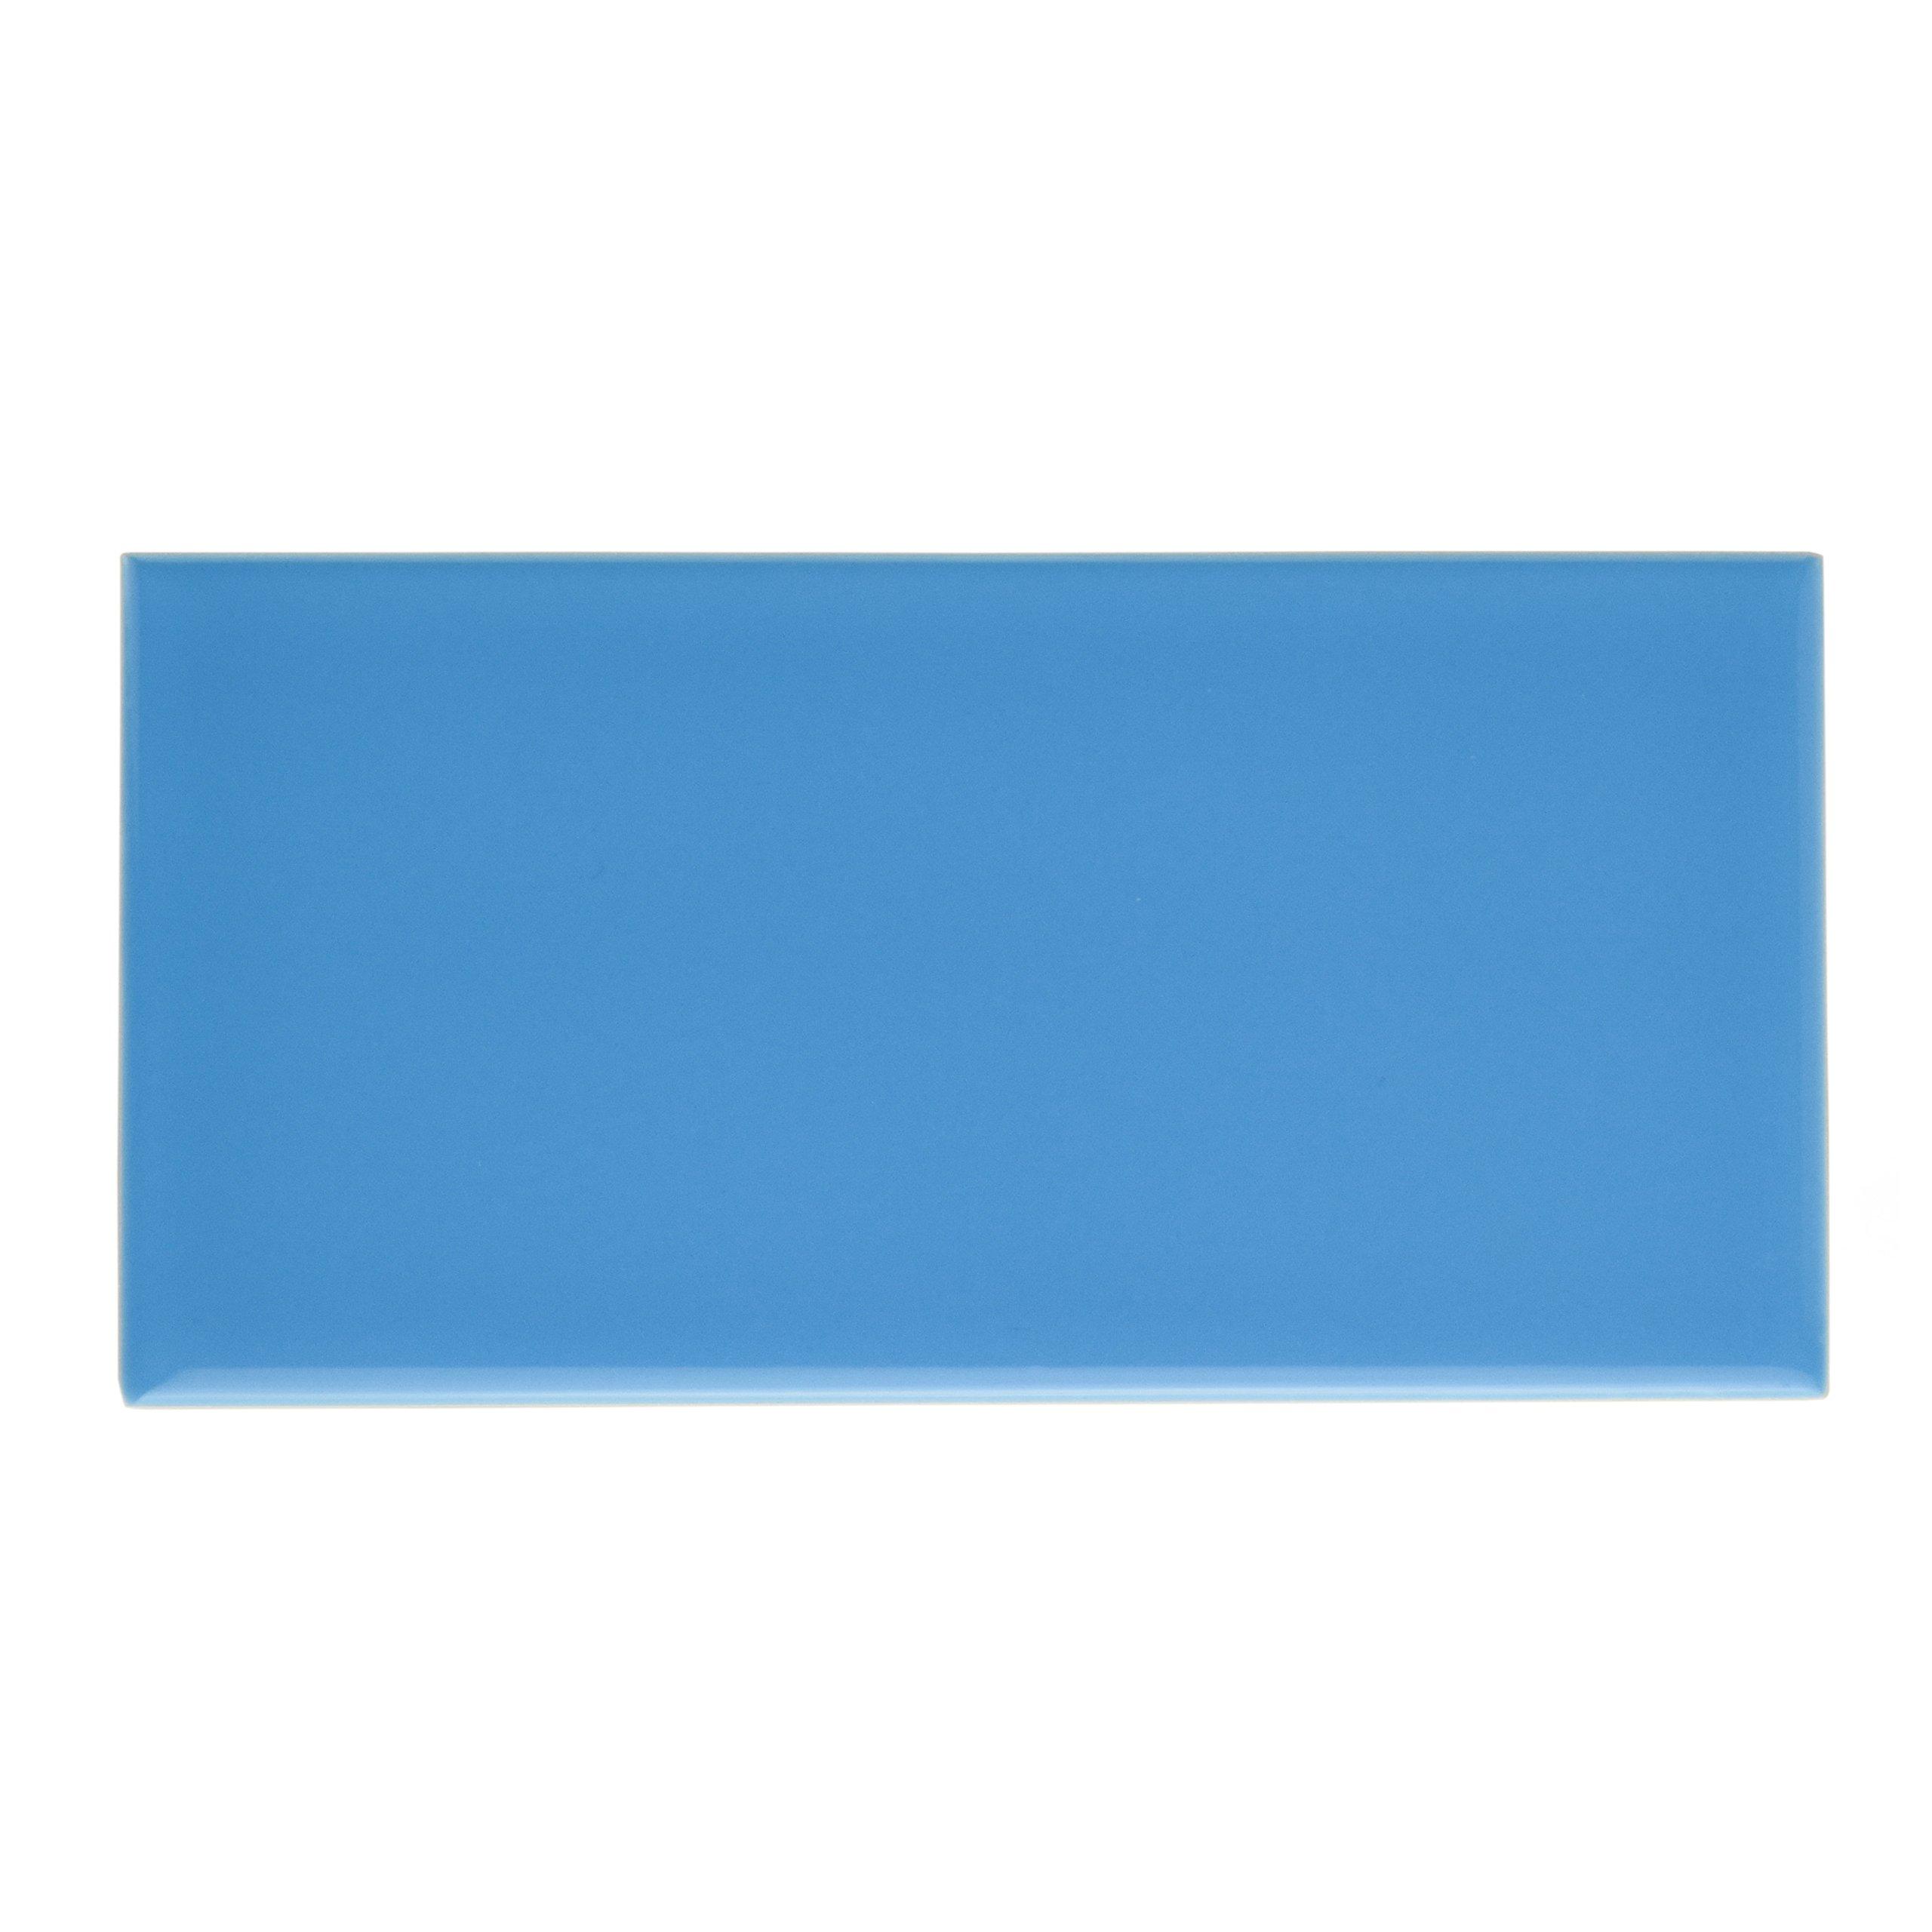 SomerTile WXR3PSCB Pente Subway Ceramic Wall Tile, 3'' x 6'', Glossy Calm Blue by SOMERTILE